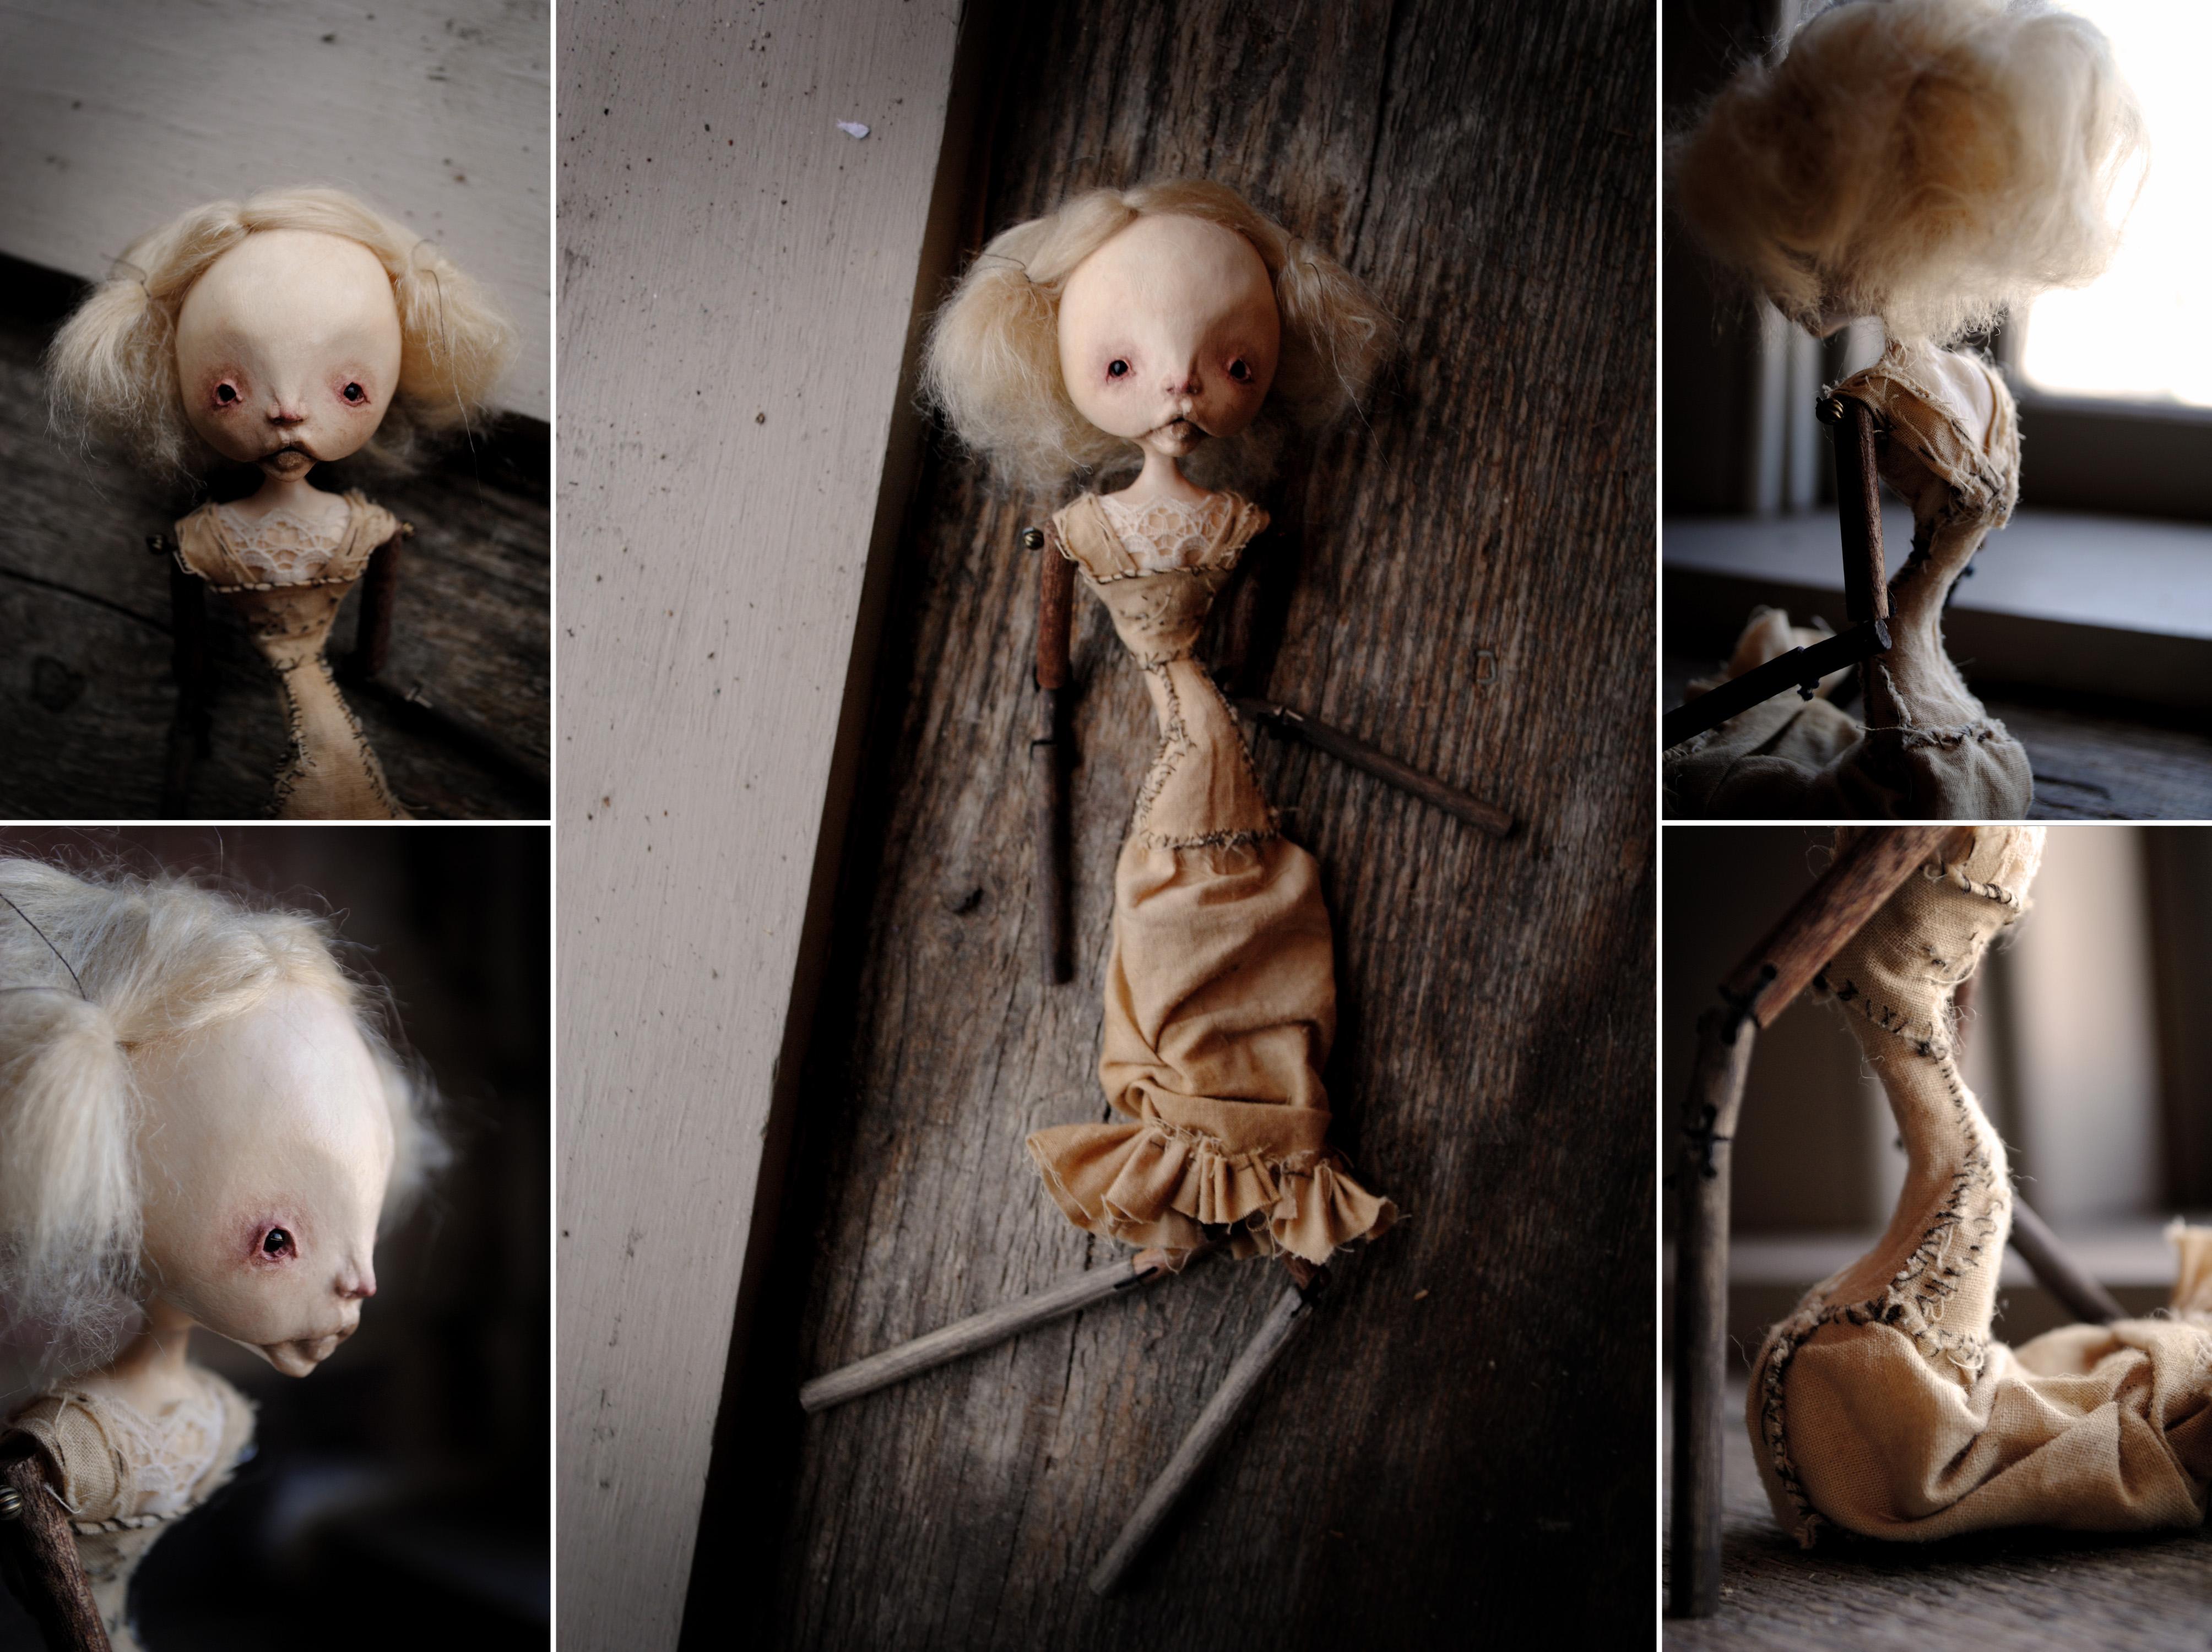 Celeste by CheekieBottoms